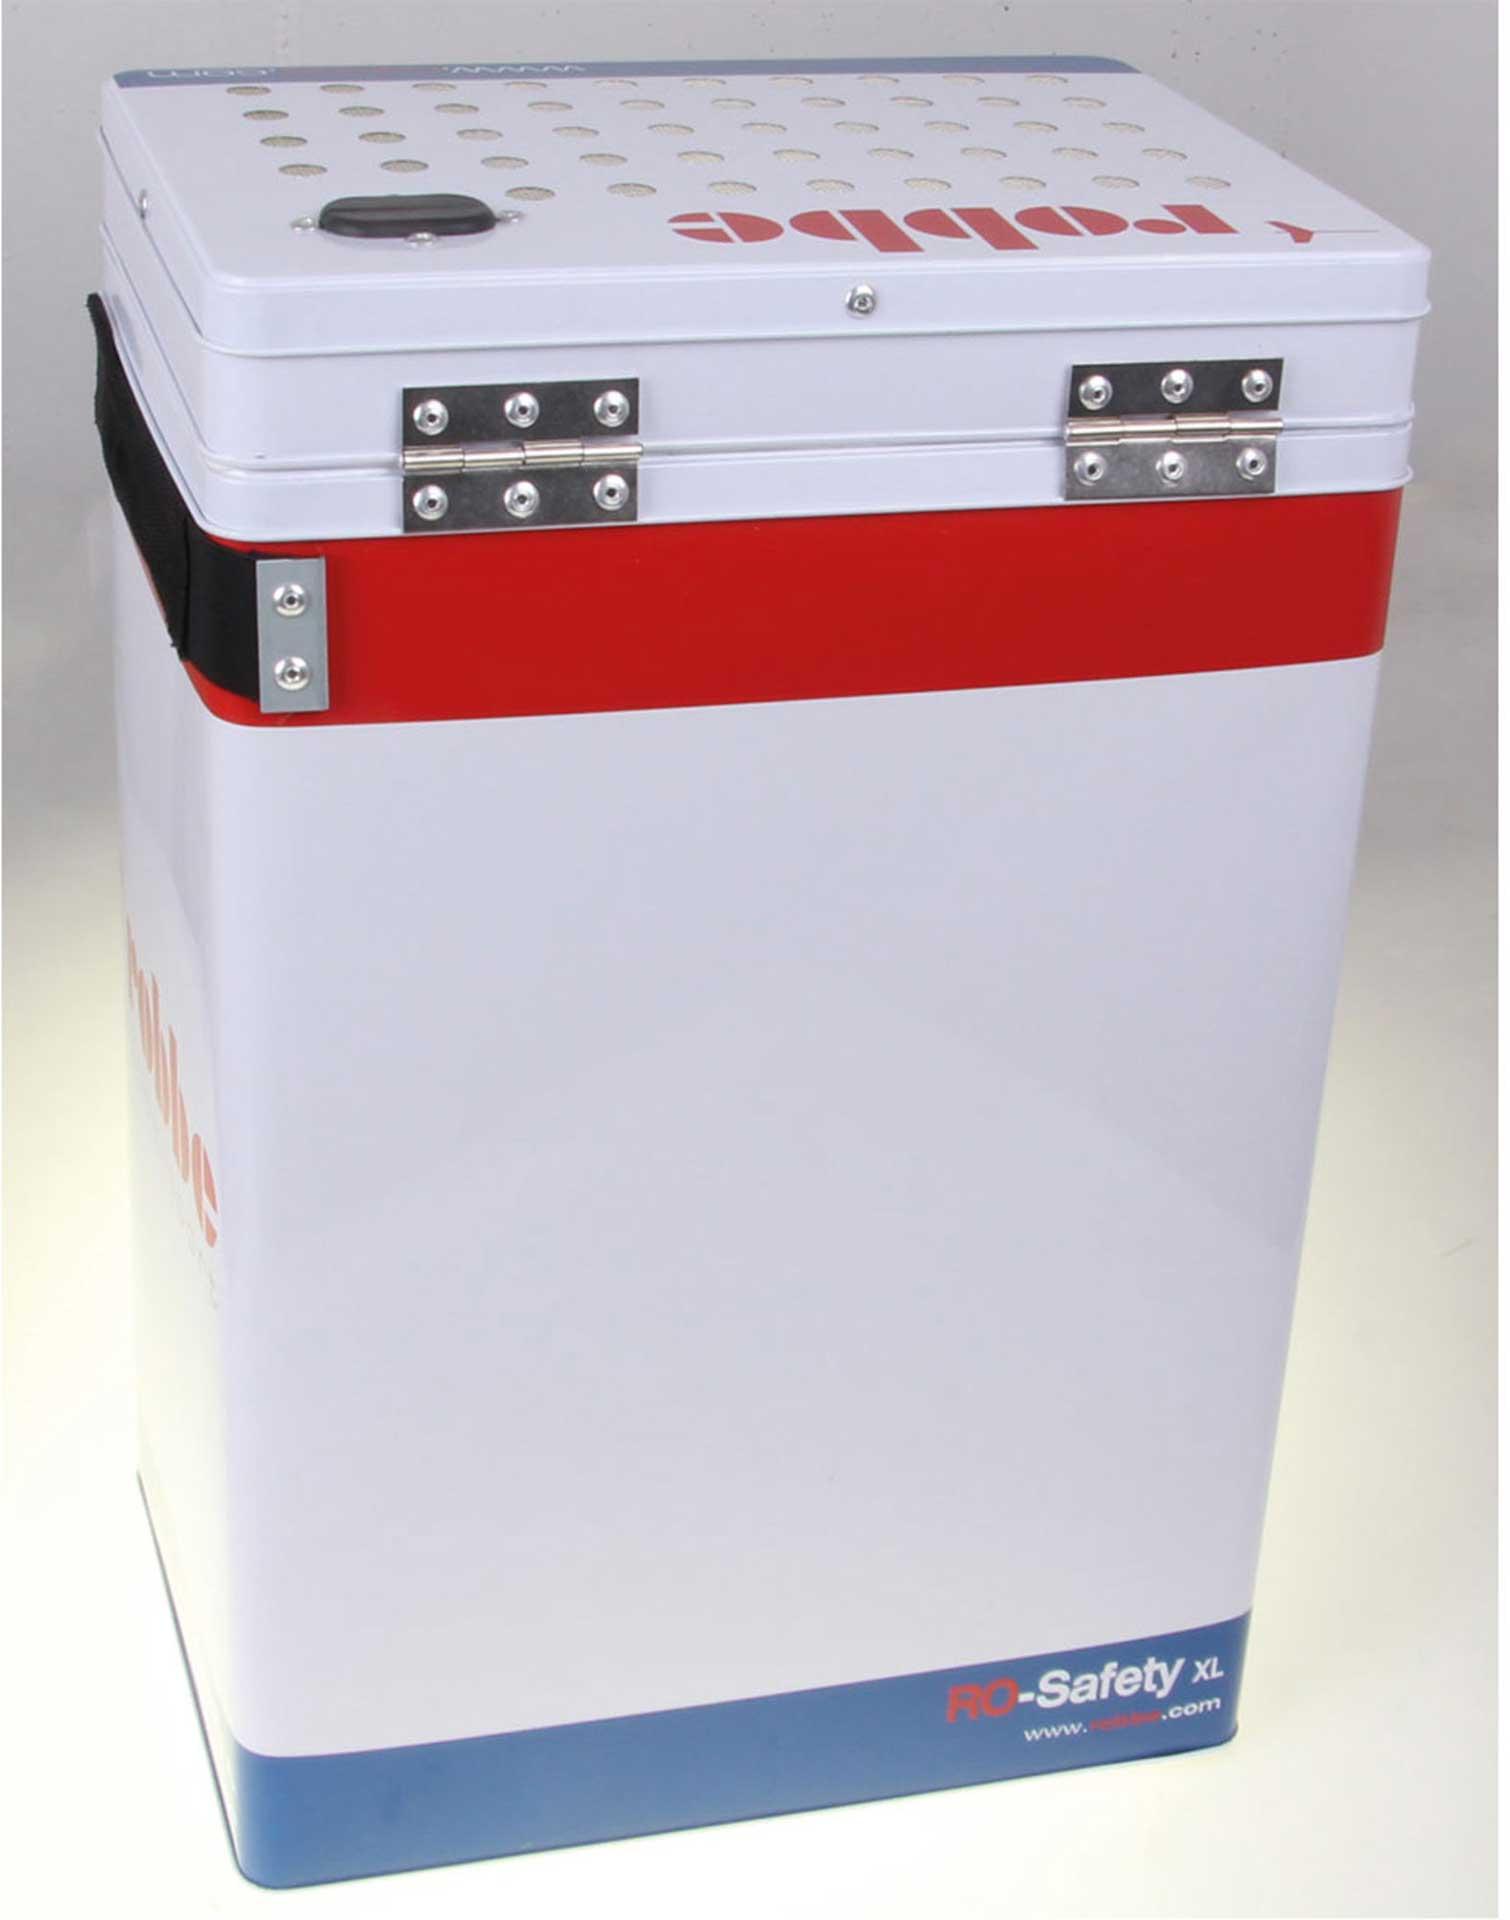 Robbe Modellsport RO-SAFETY XL LIPO TRESOR